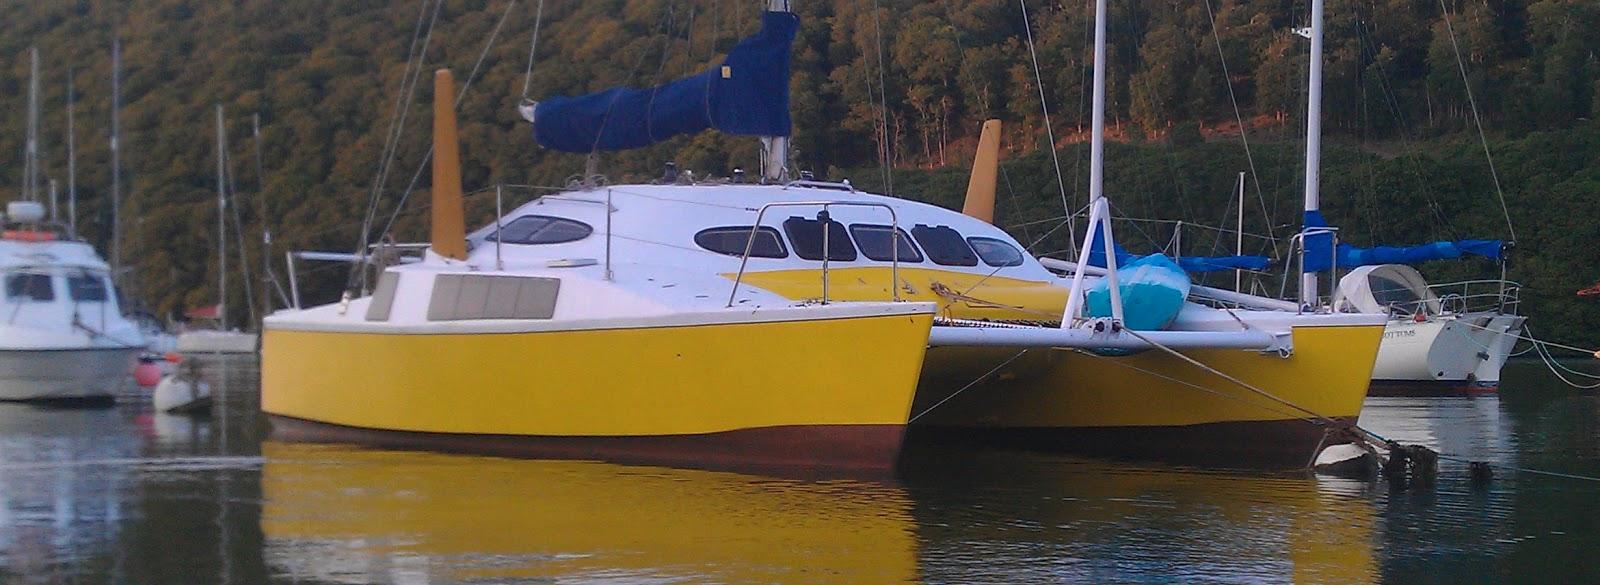 Robert richard woods catamarans how to building plans Richard woods designs